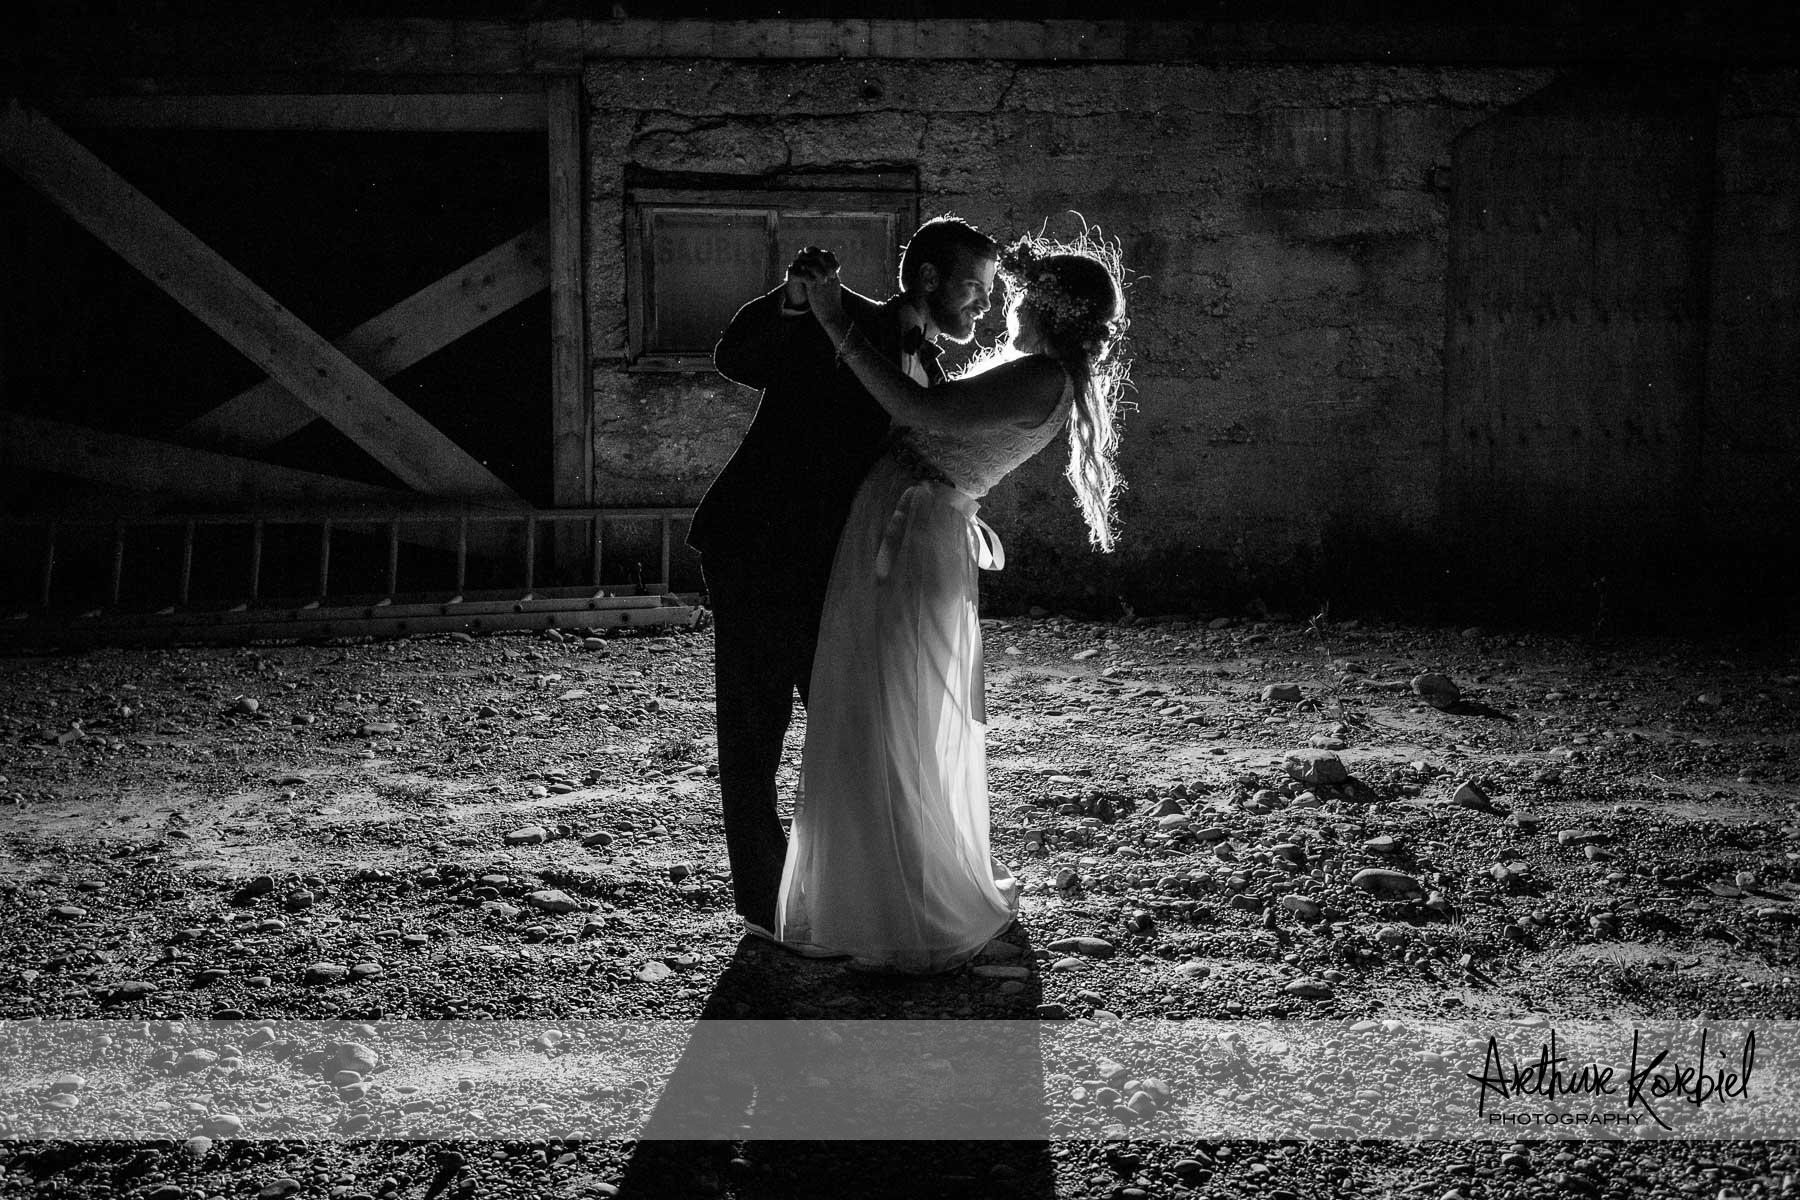 Arthur Korbiel Photography - London Wedding Photographer - Rogers-053.jpg